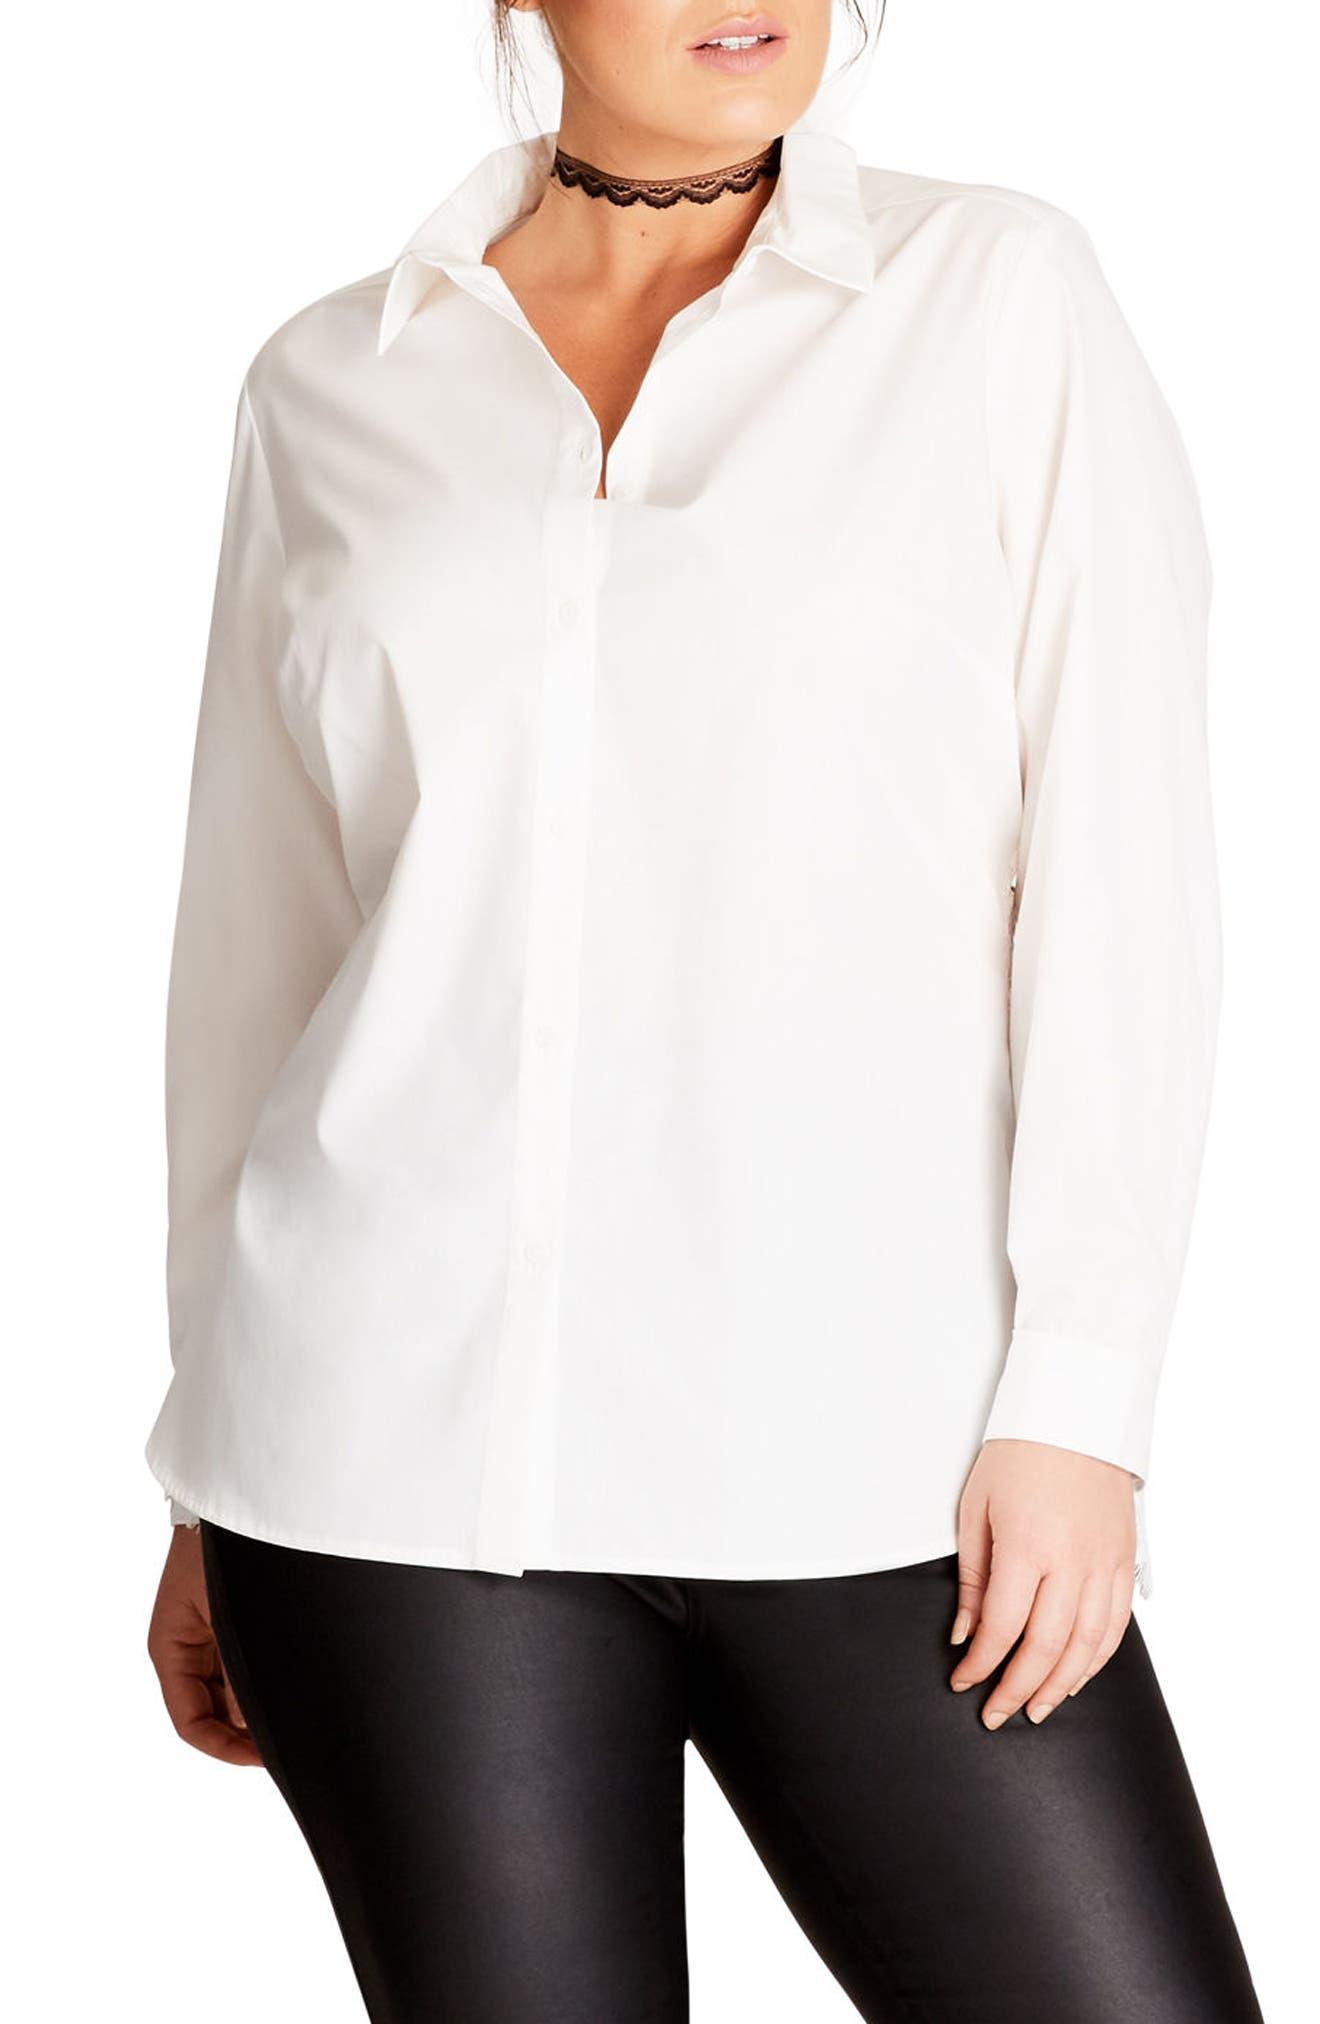 Alternate Image 1 Selected - City Chic Crisp Lace Back Shirt (Plus Size)